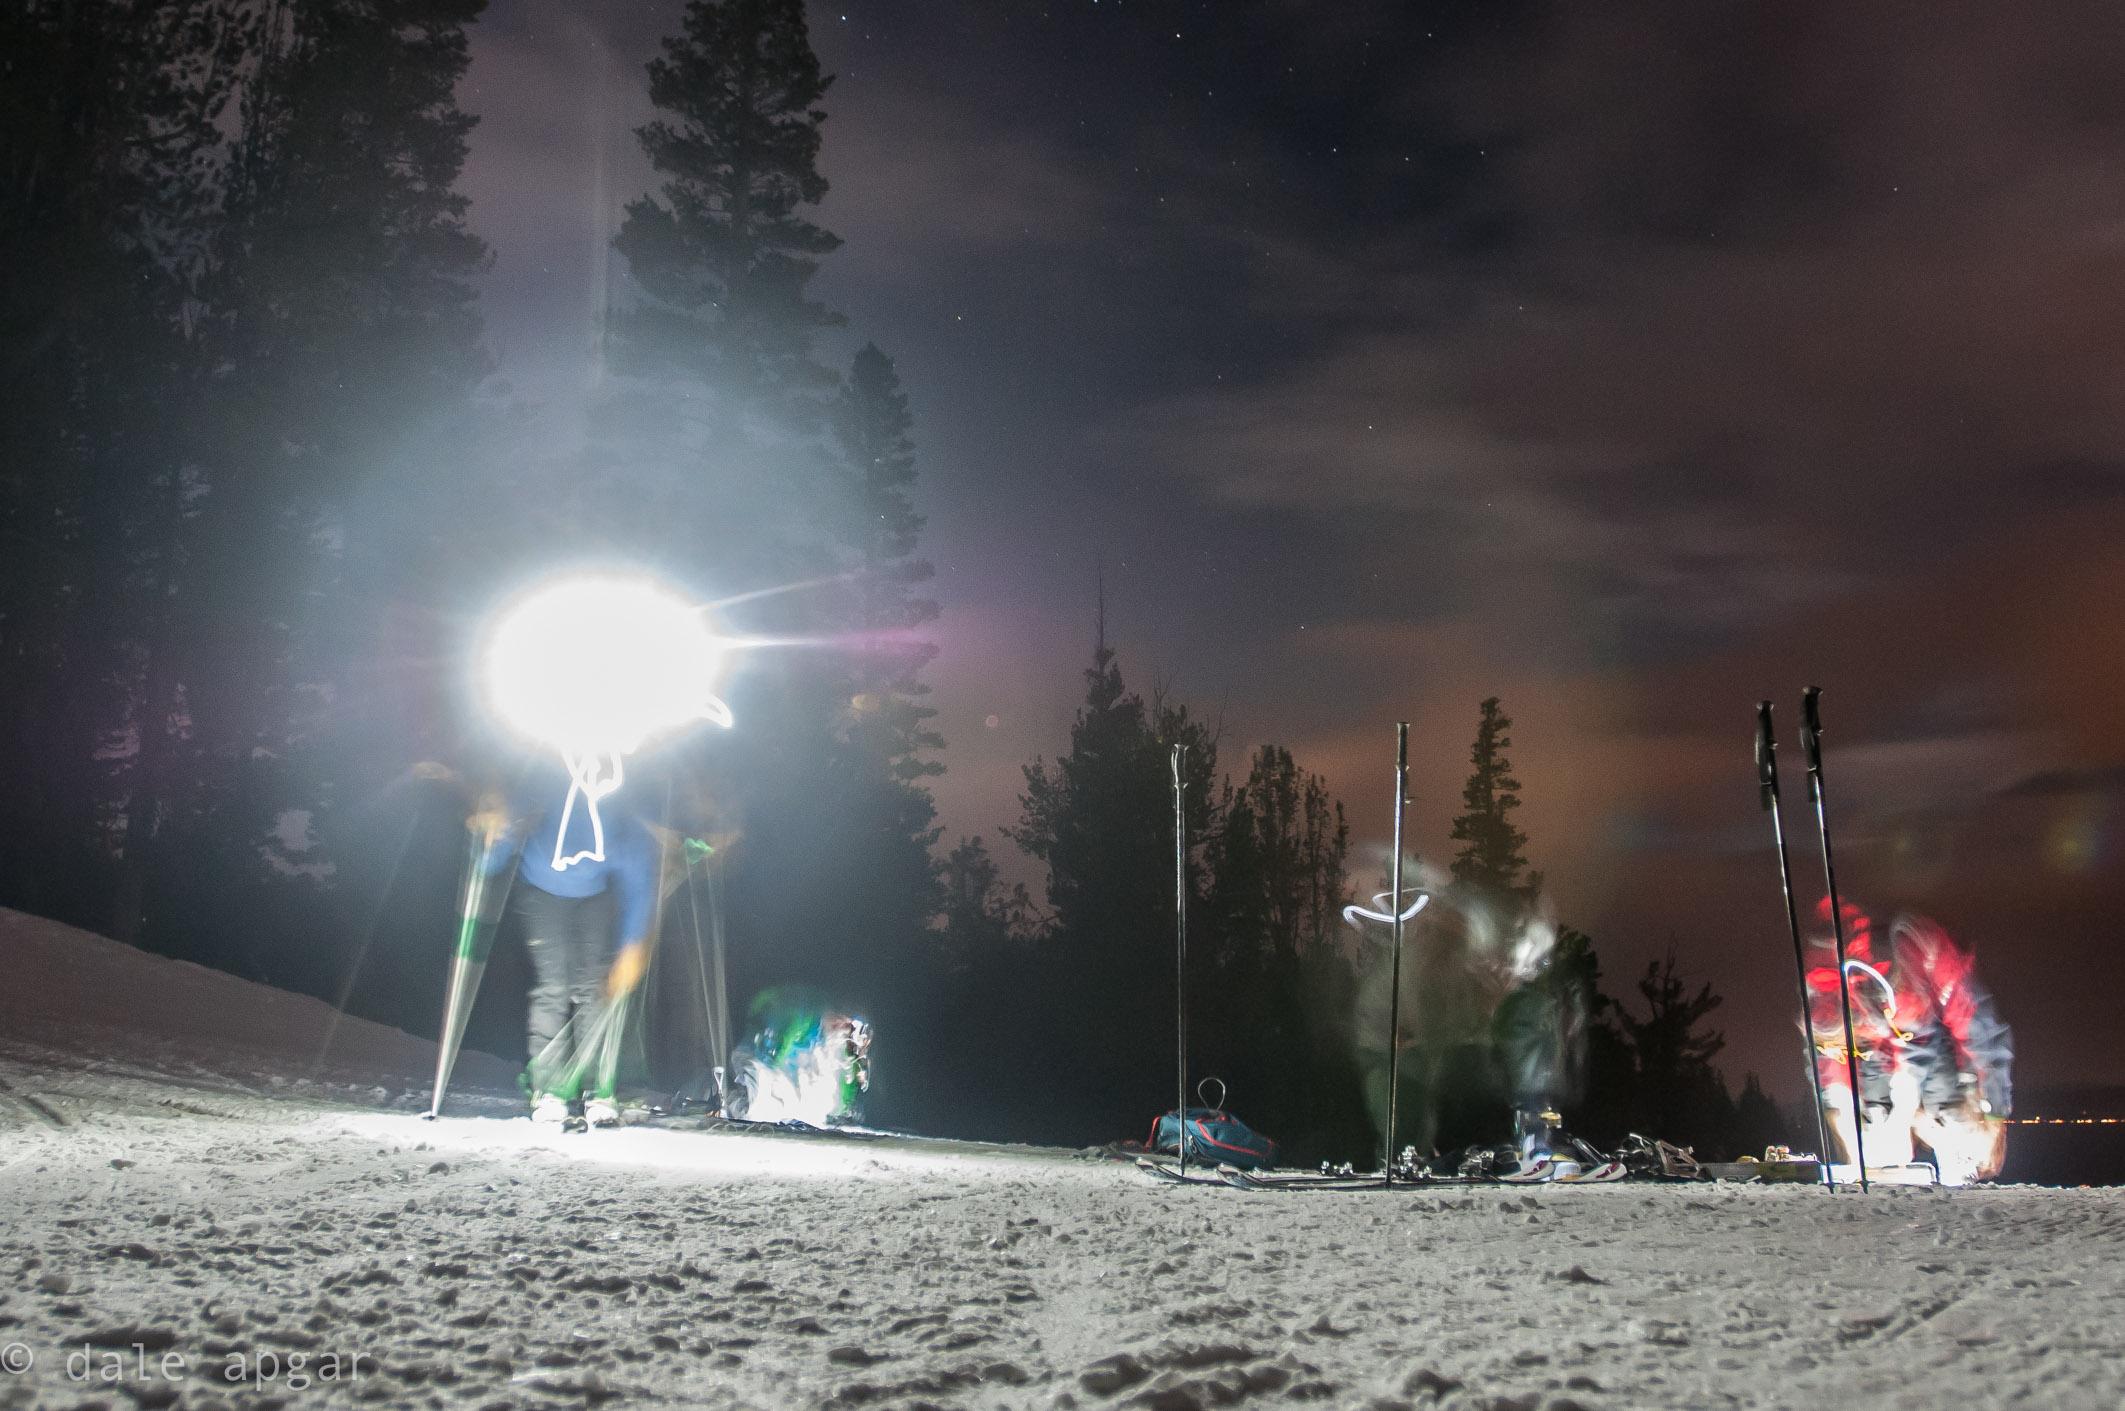 dale_apgar_ski-33.jpg